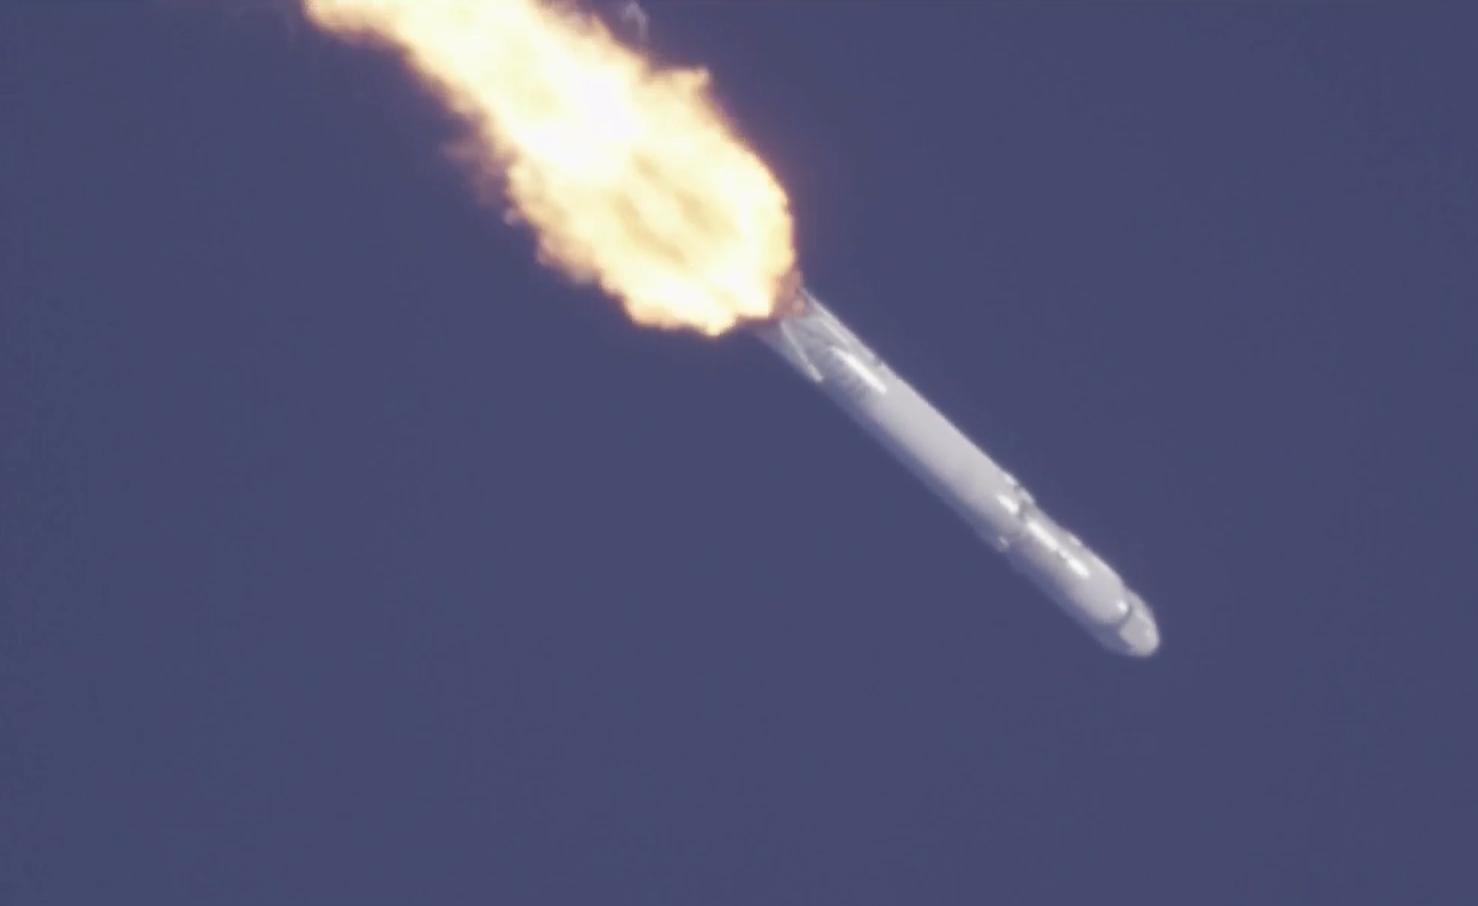 CRS-13 max-Q